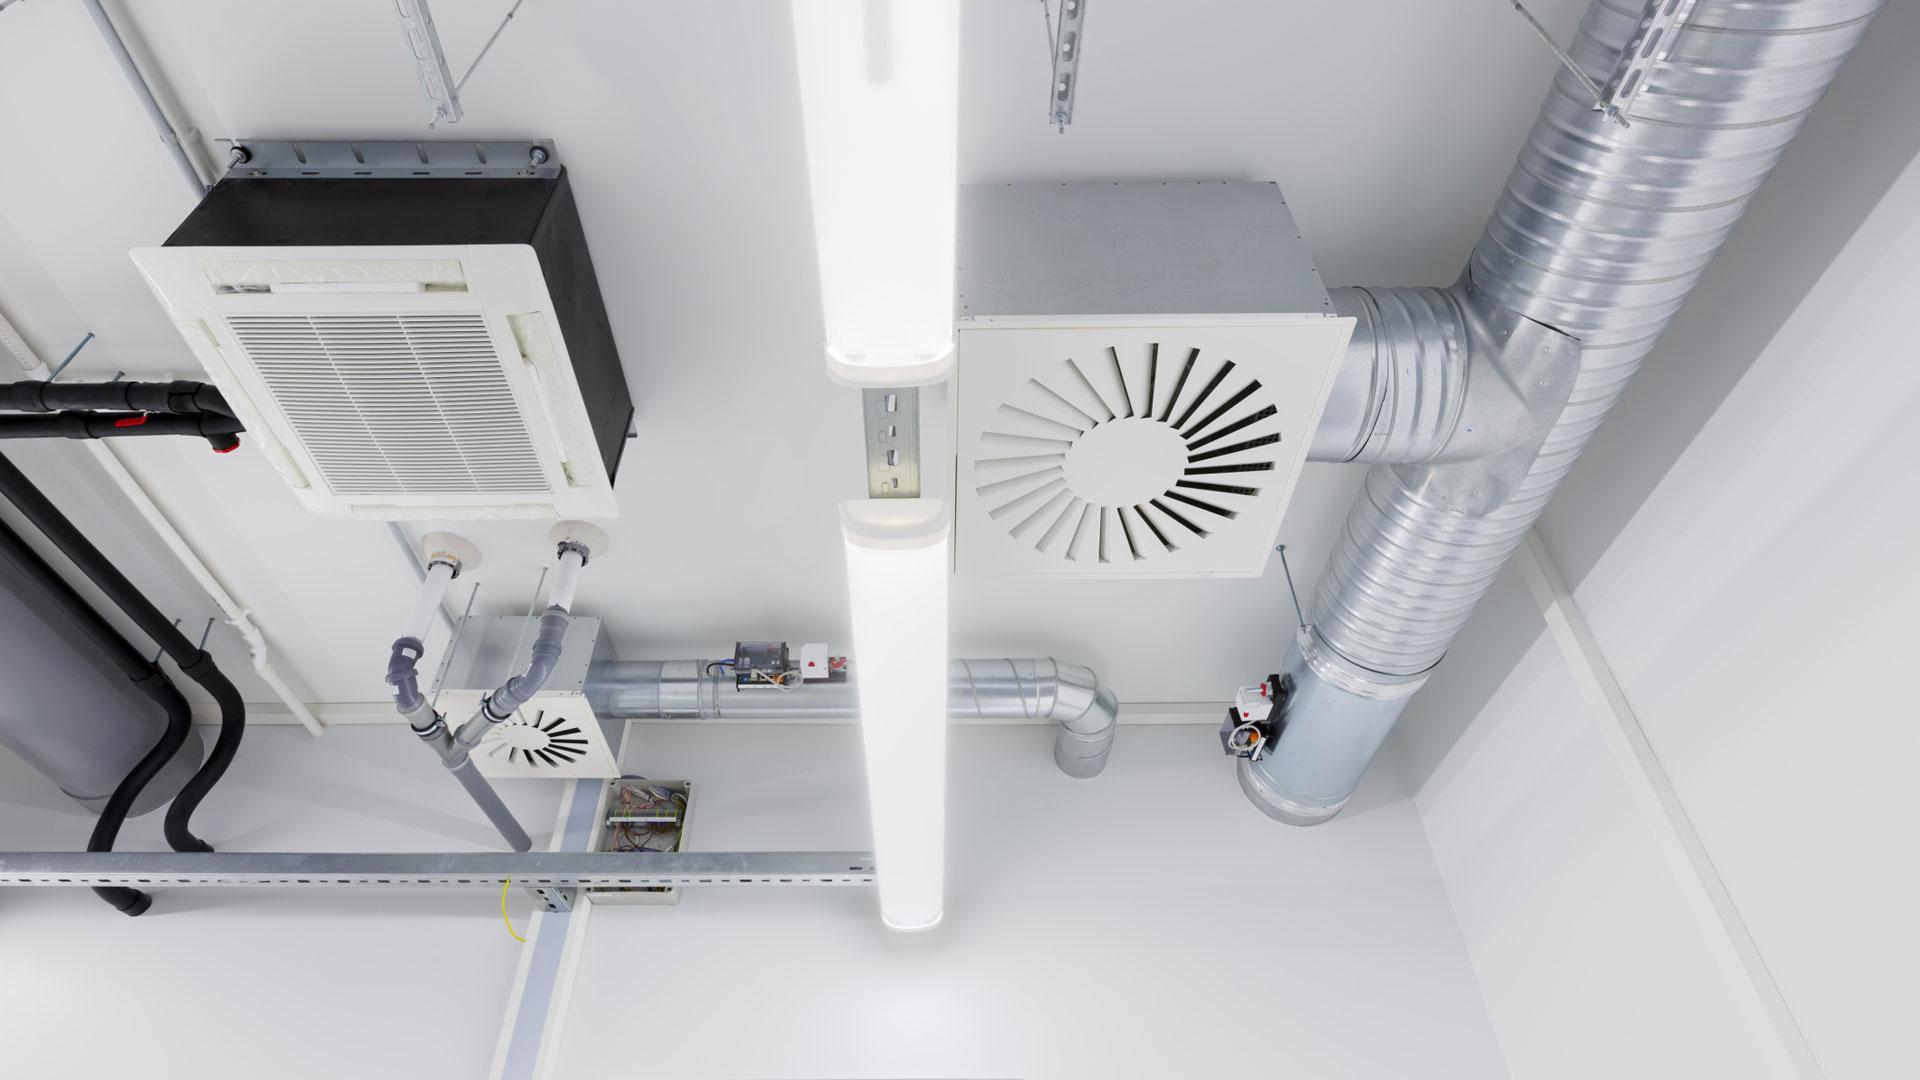 Fresh Air Ventilation Systems supply ventilation system